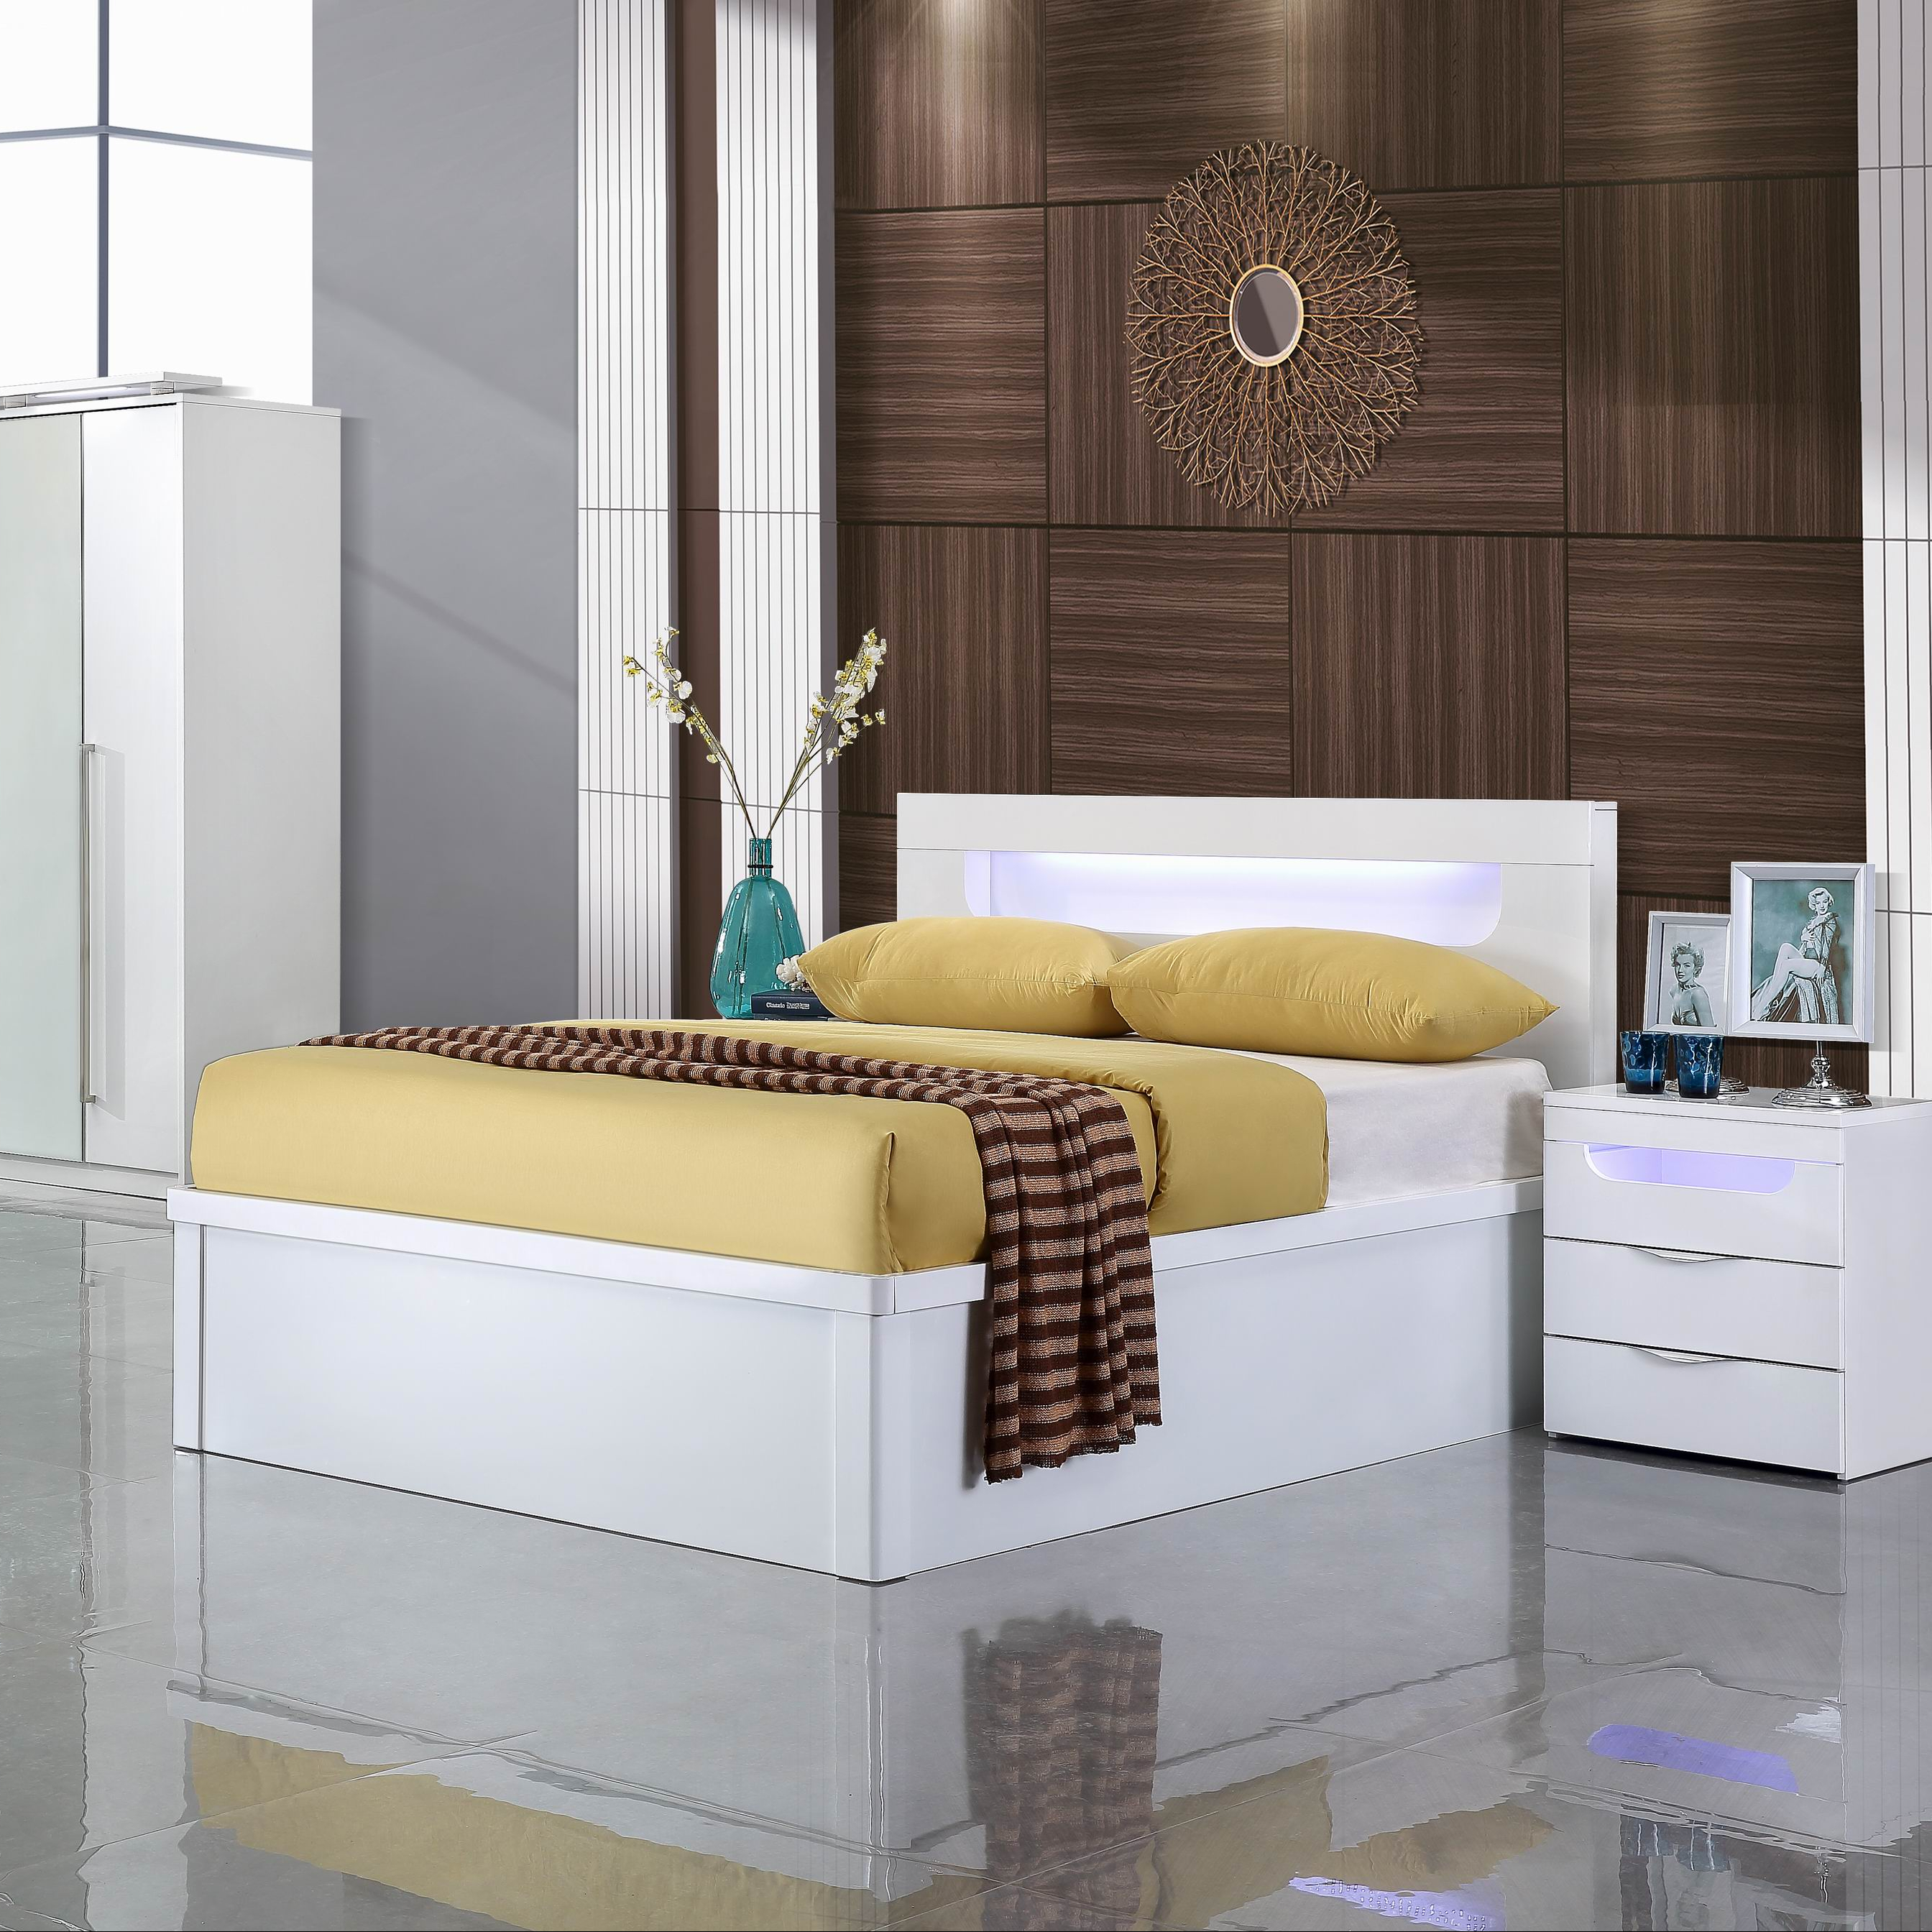 . Direct Buy Furniture Full House Furniture Bedroom Furniture Sets   Buy  Direct Buy Furniture Full Set Bedroom Full Bedroom Product on Alibaba com